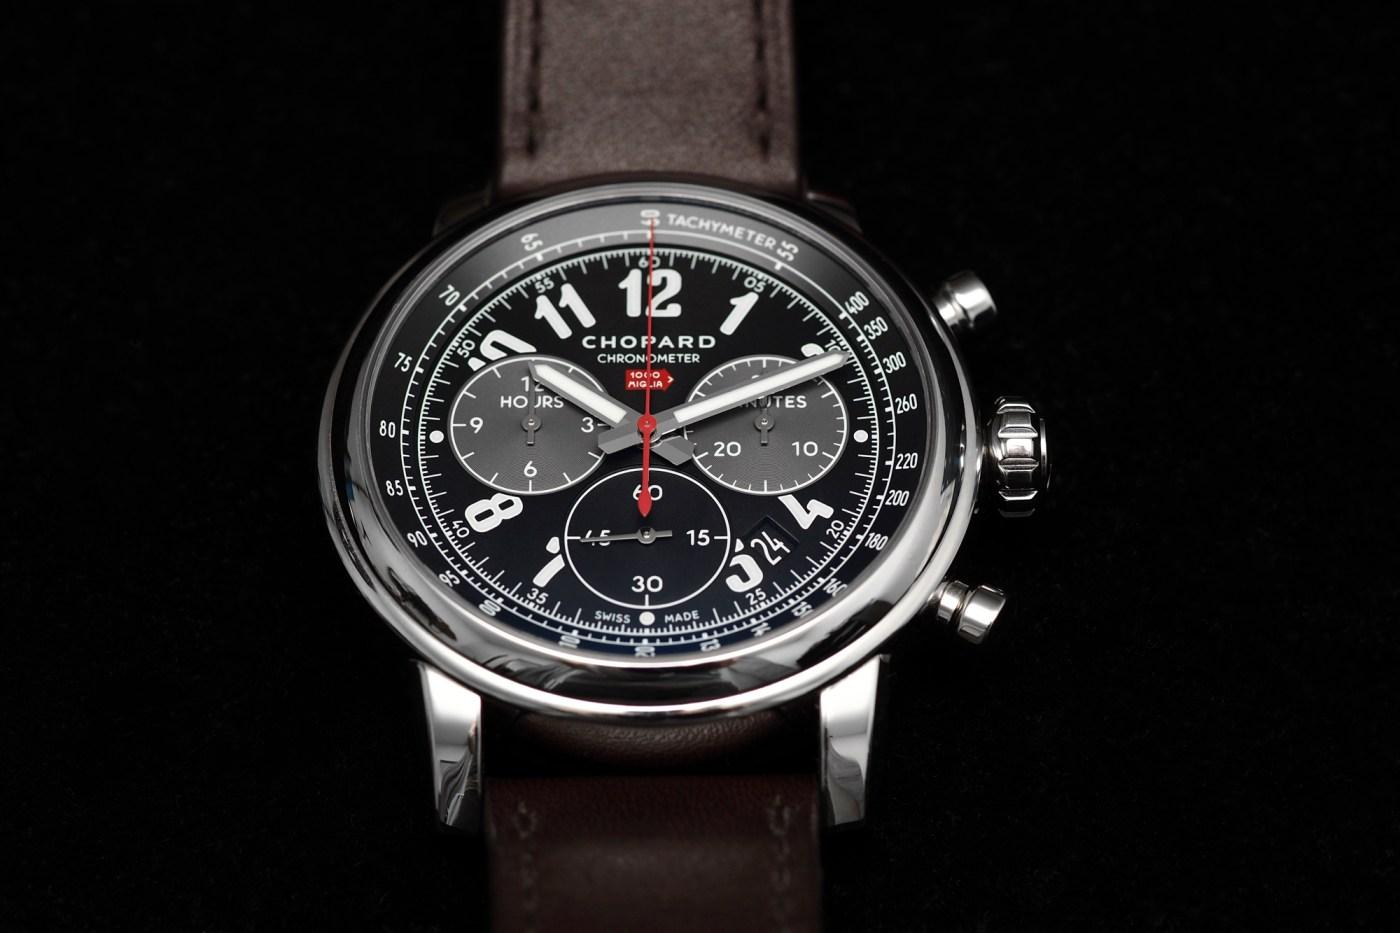 Chopard Mille Miglia 2016 XL Race Edition Chronograph